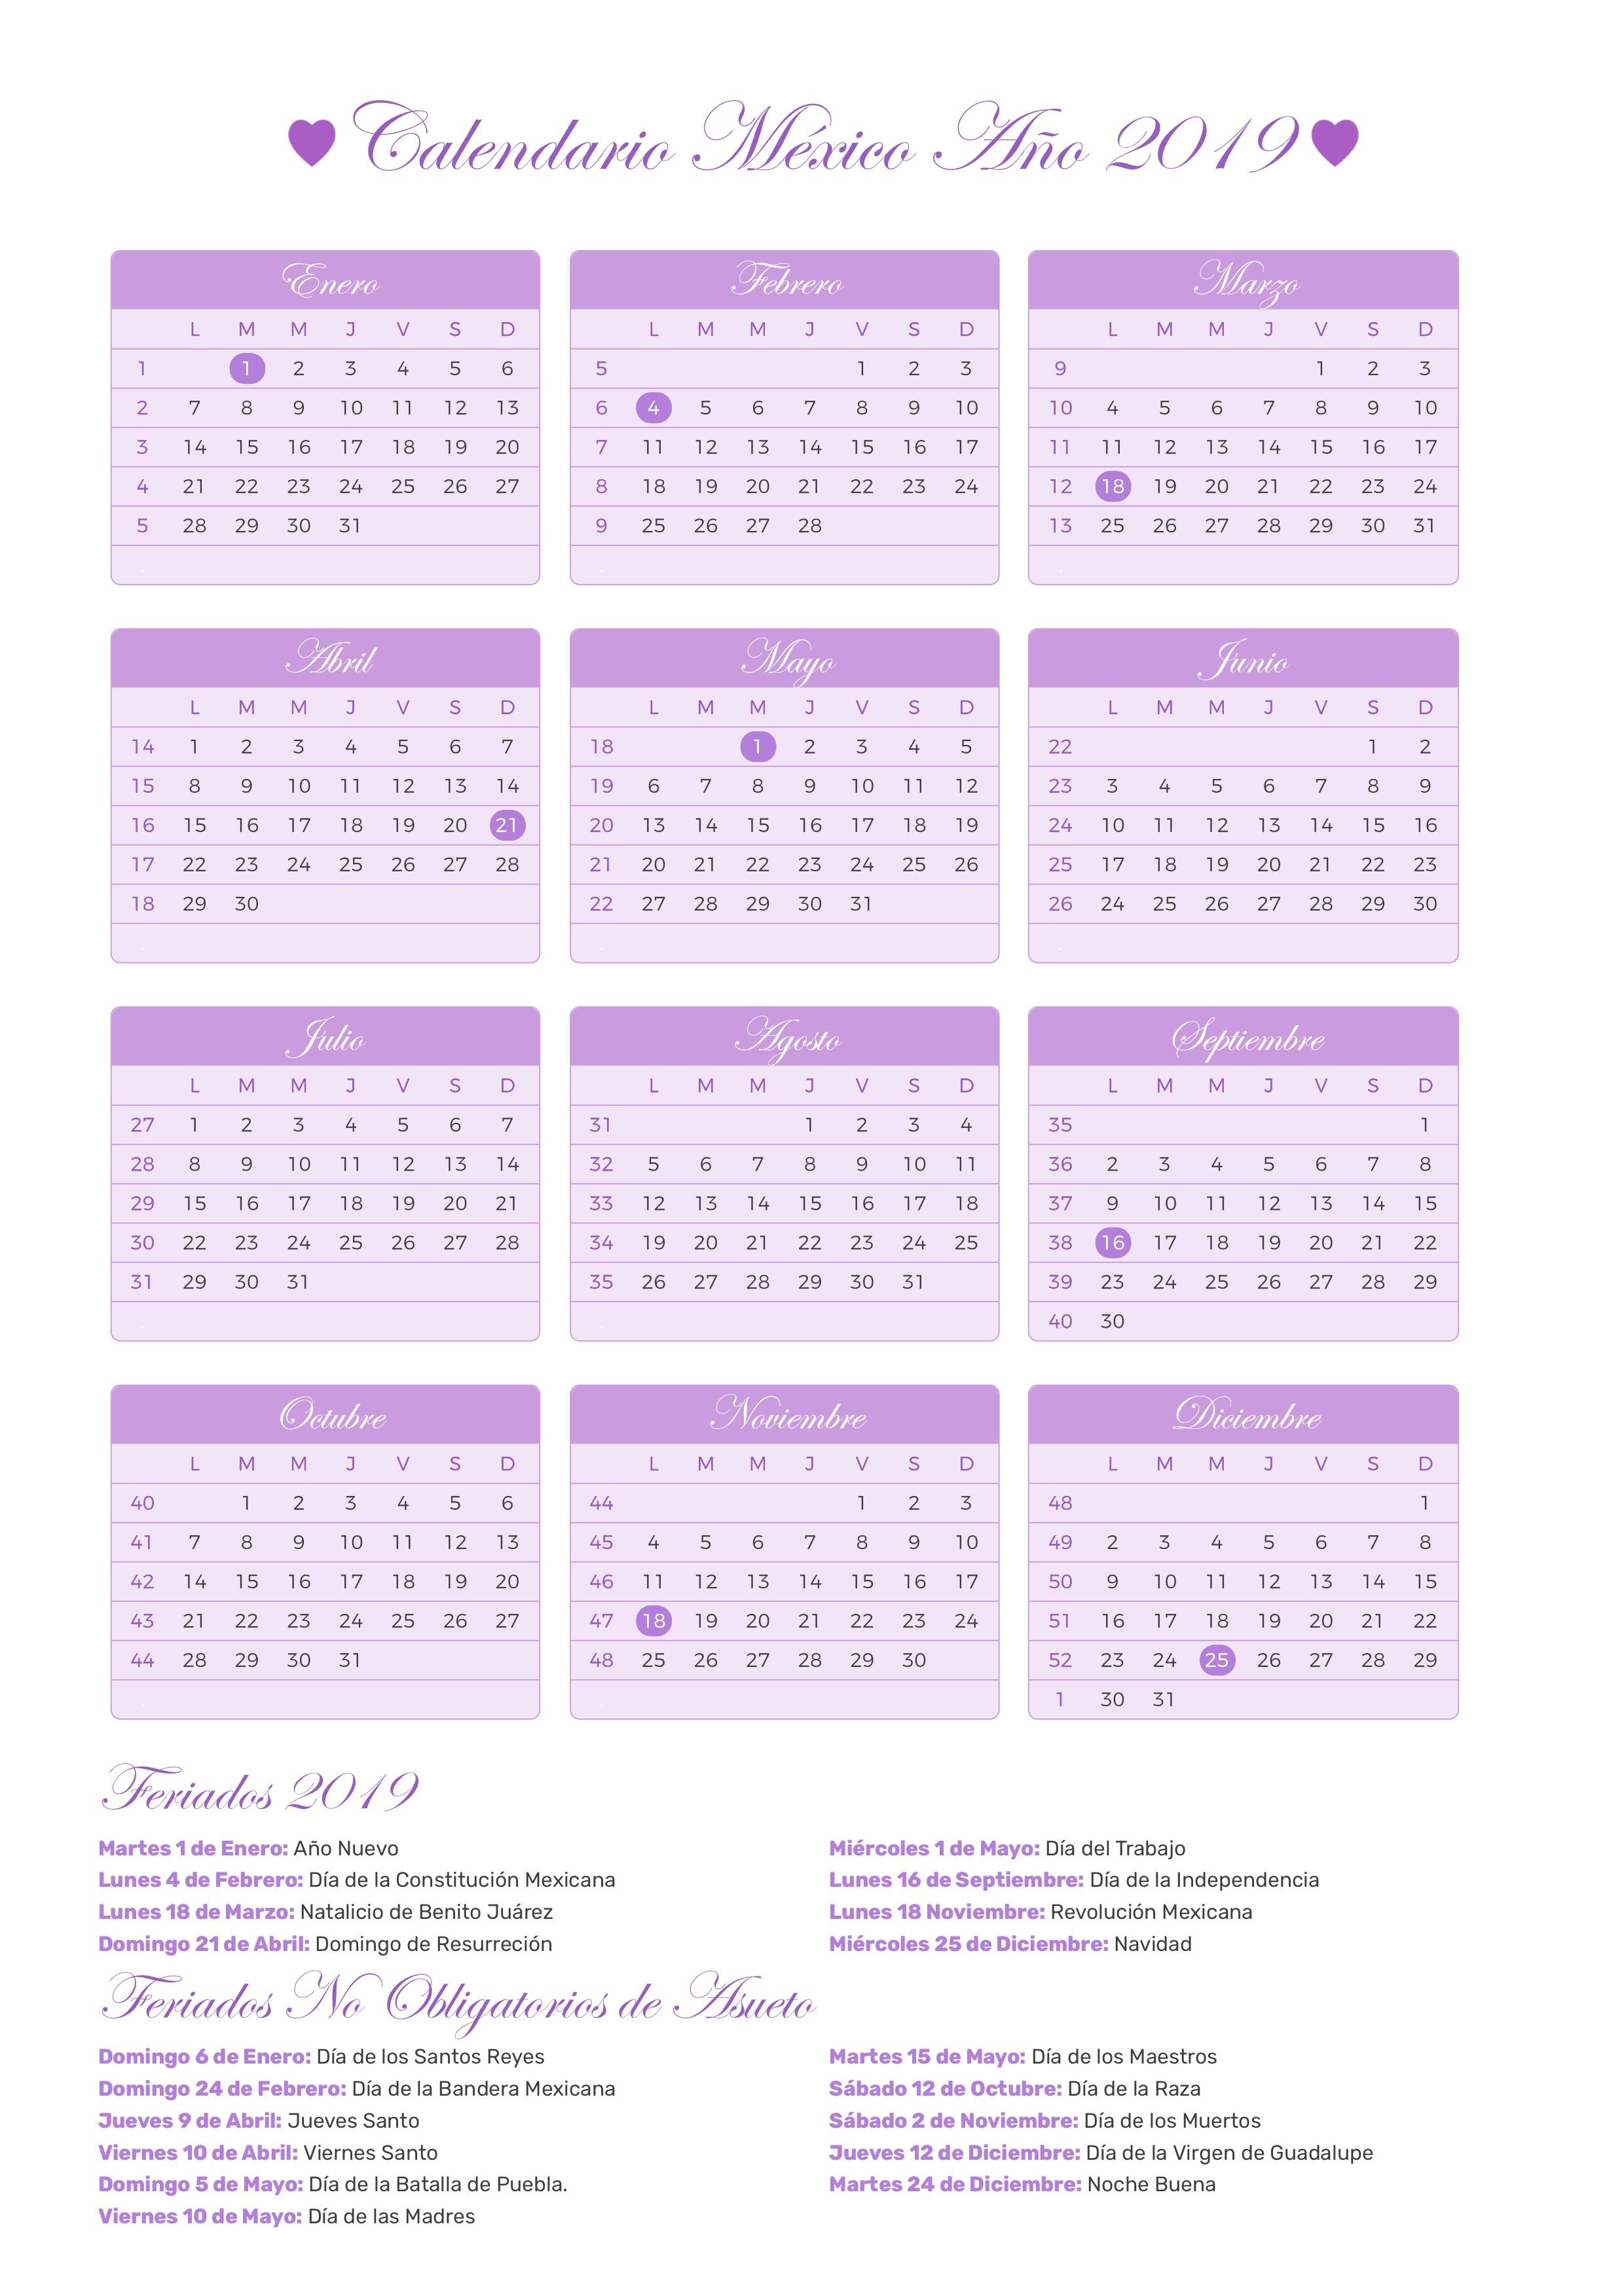 Calendario 2020 Argentina Para Imprimir Pdf.Calendario De Mexico Ano 2019 Feriados